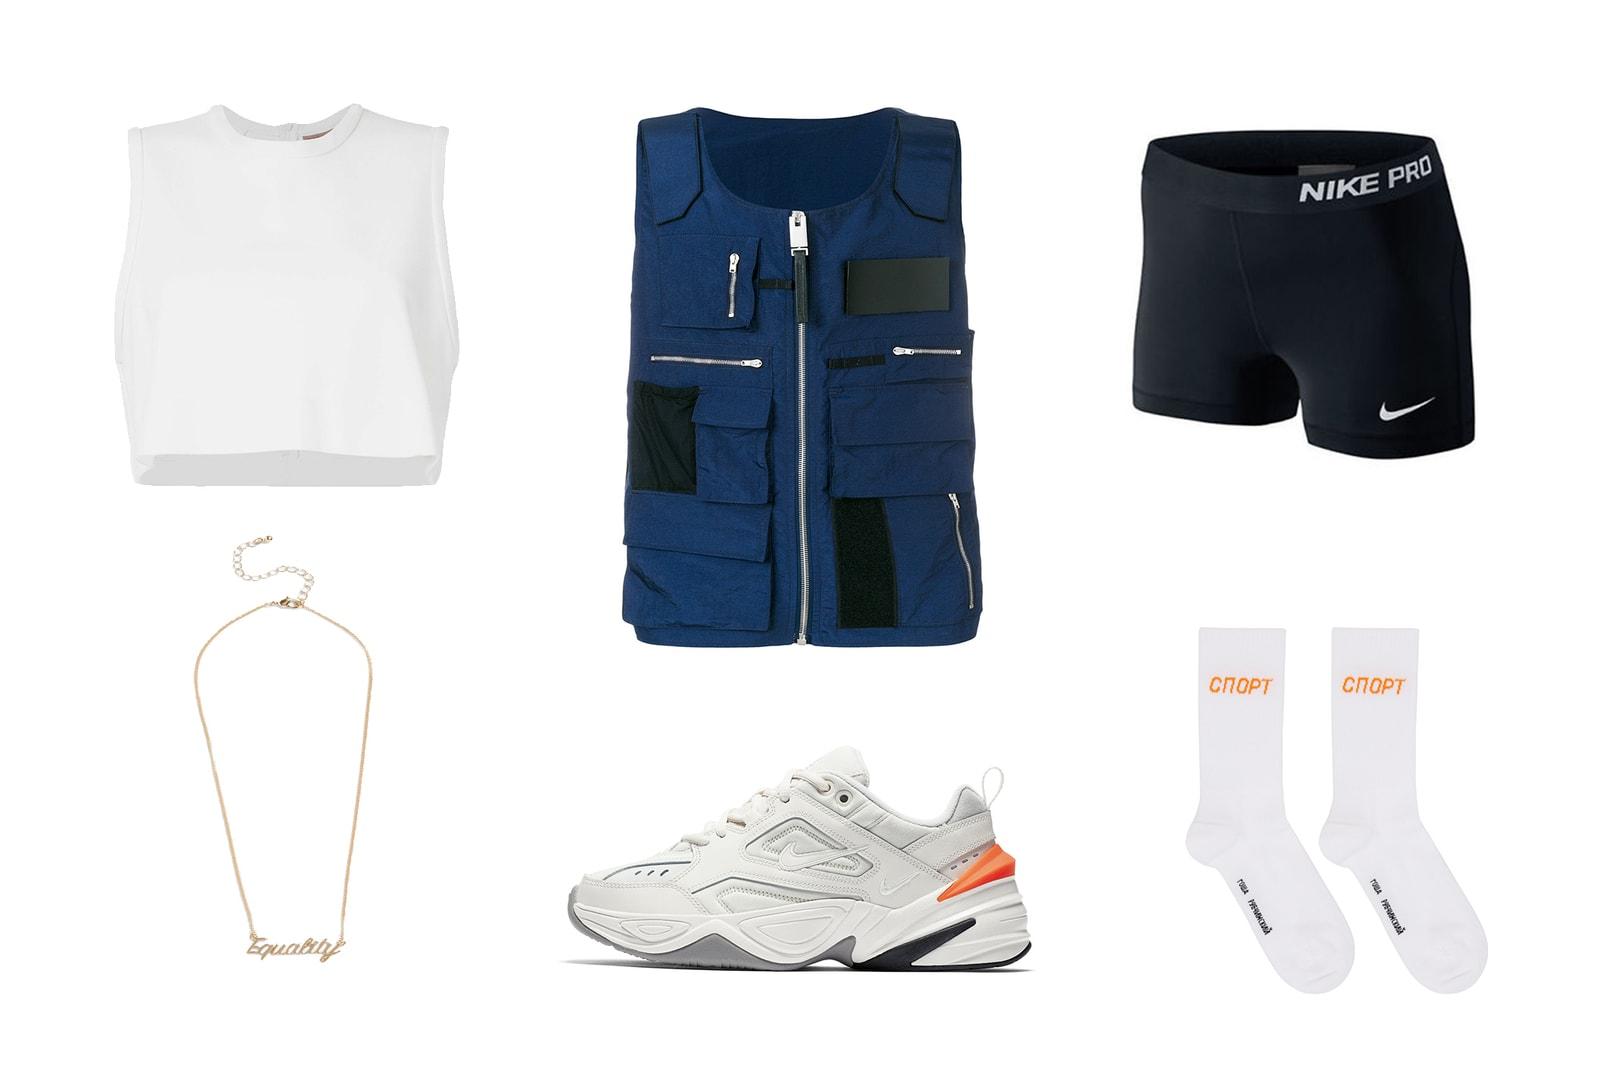 HYPEBAE Outfit Inspiration: Tactical Summer Look ALYX Trend Nike Gosha Rubchinskiy